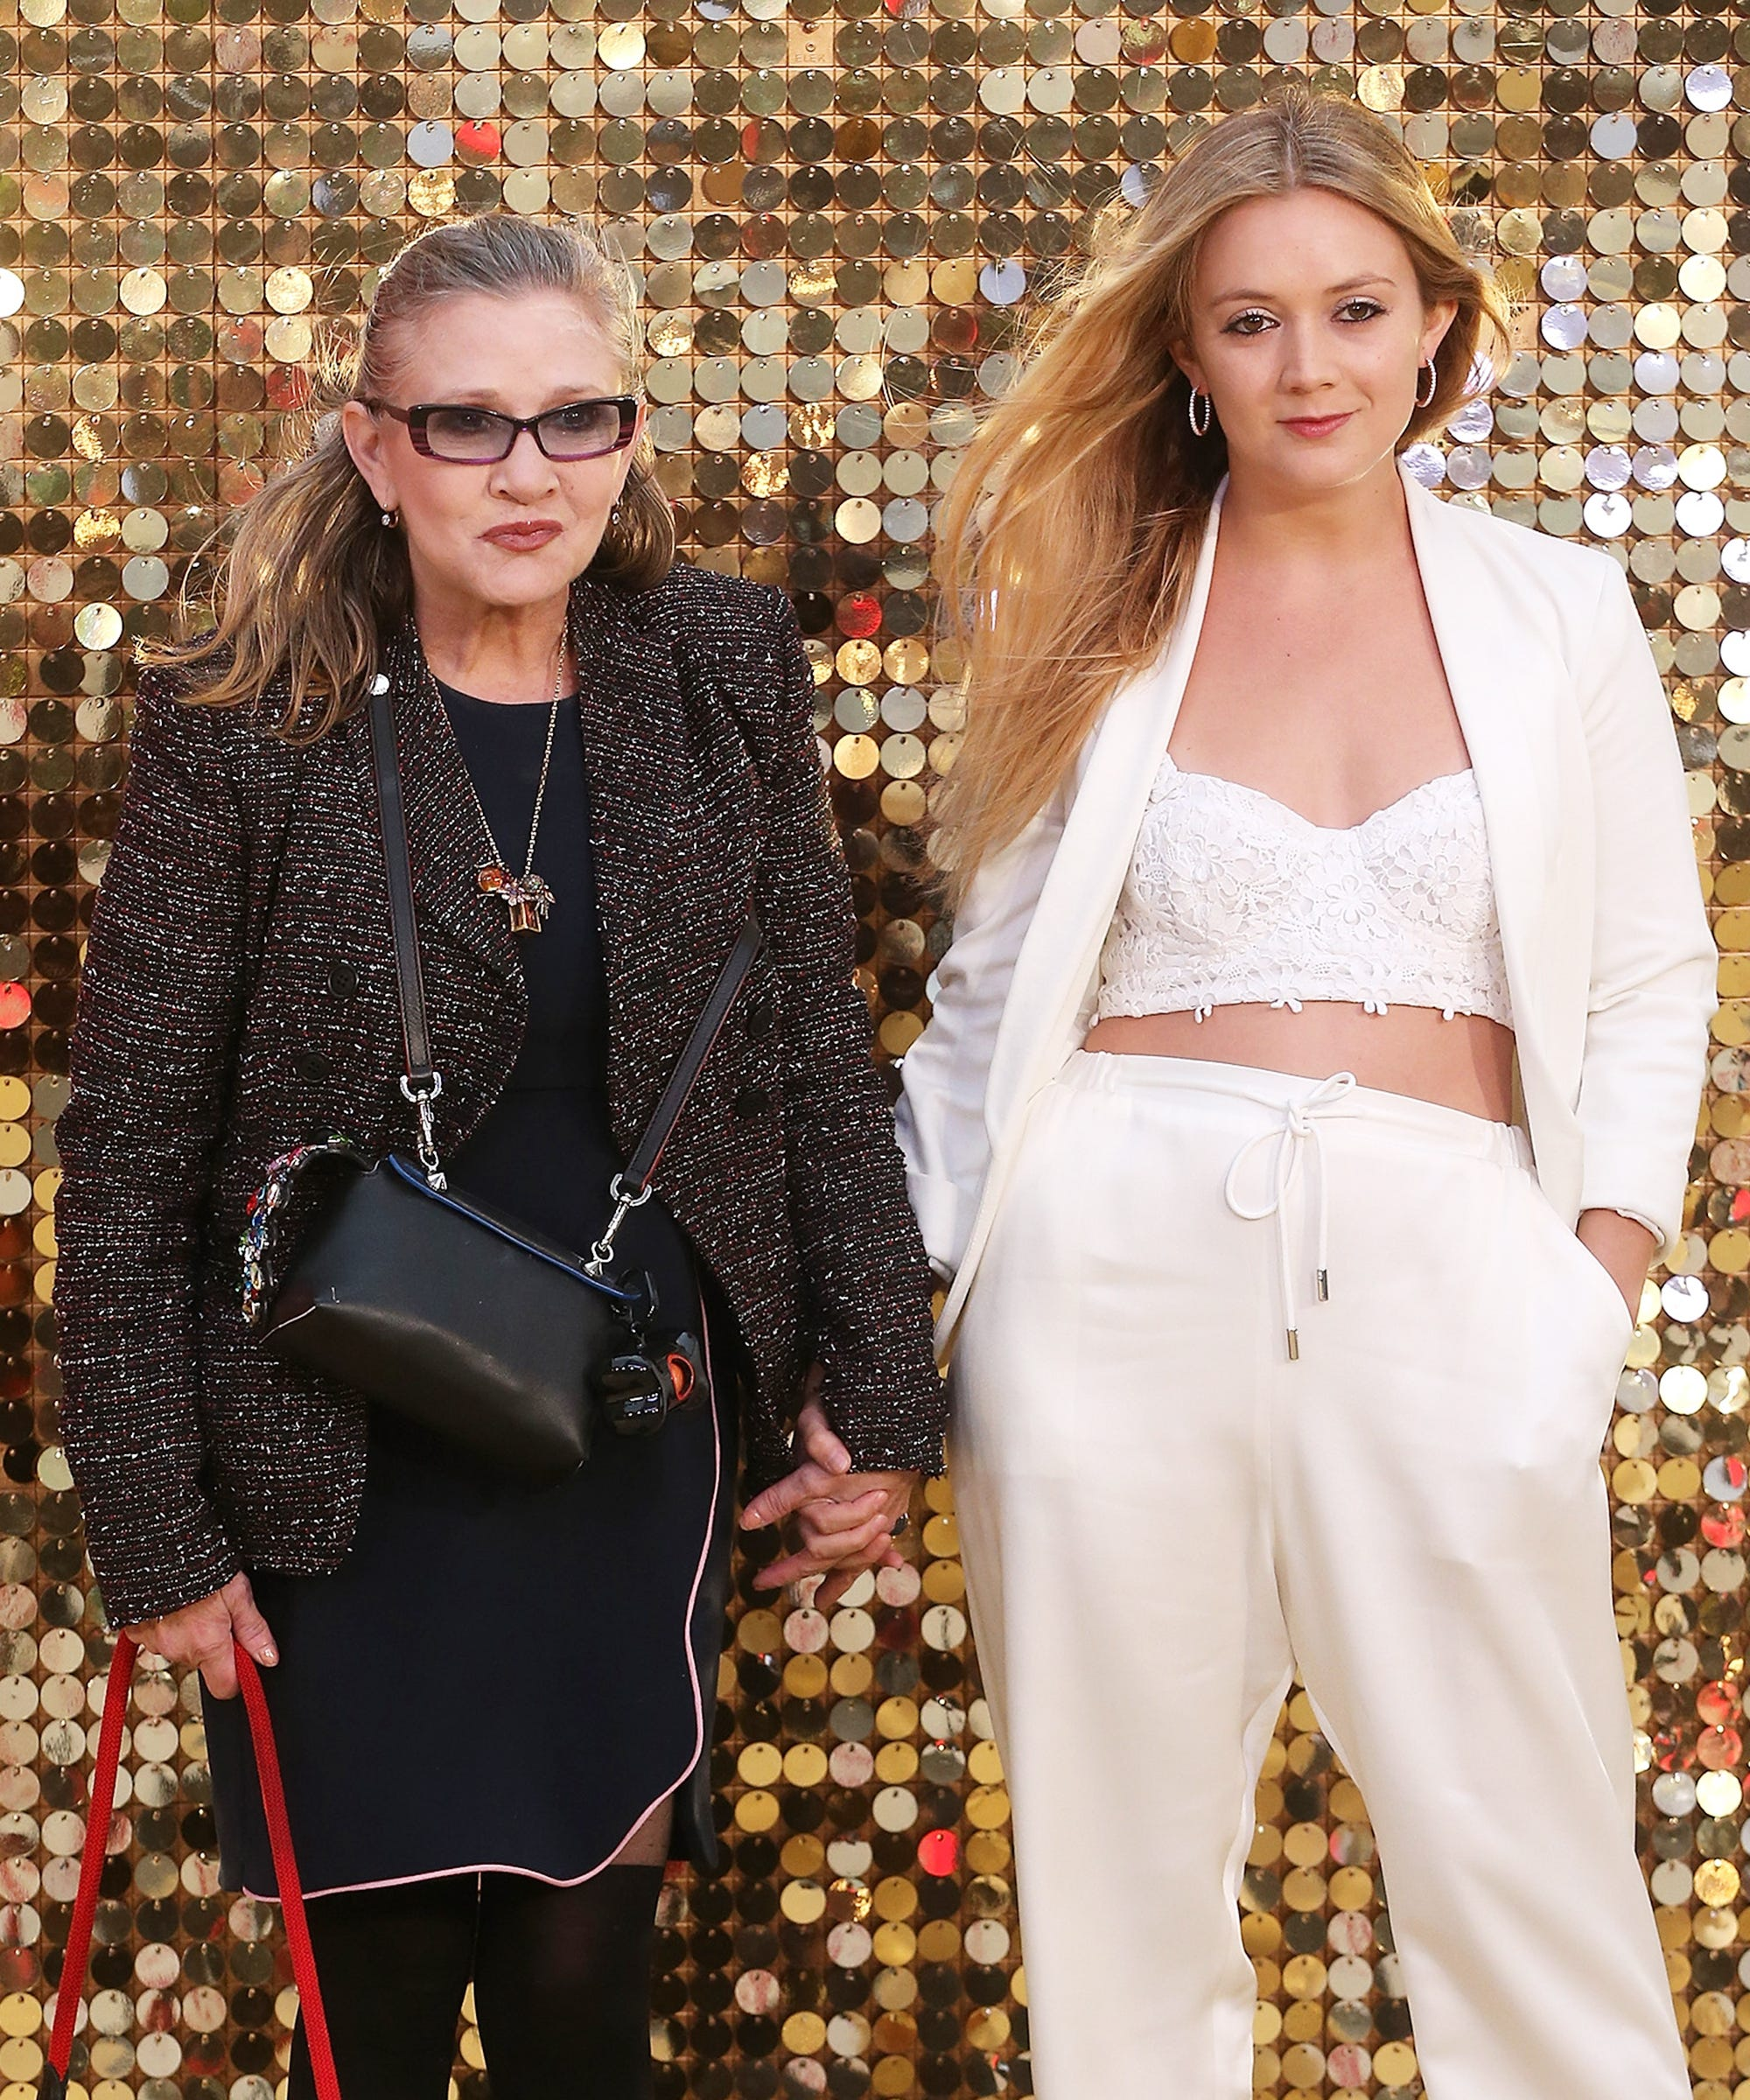 Billie Lourd Will Share Carrie Fisher Star Wars Scenes